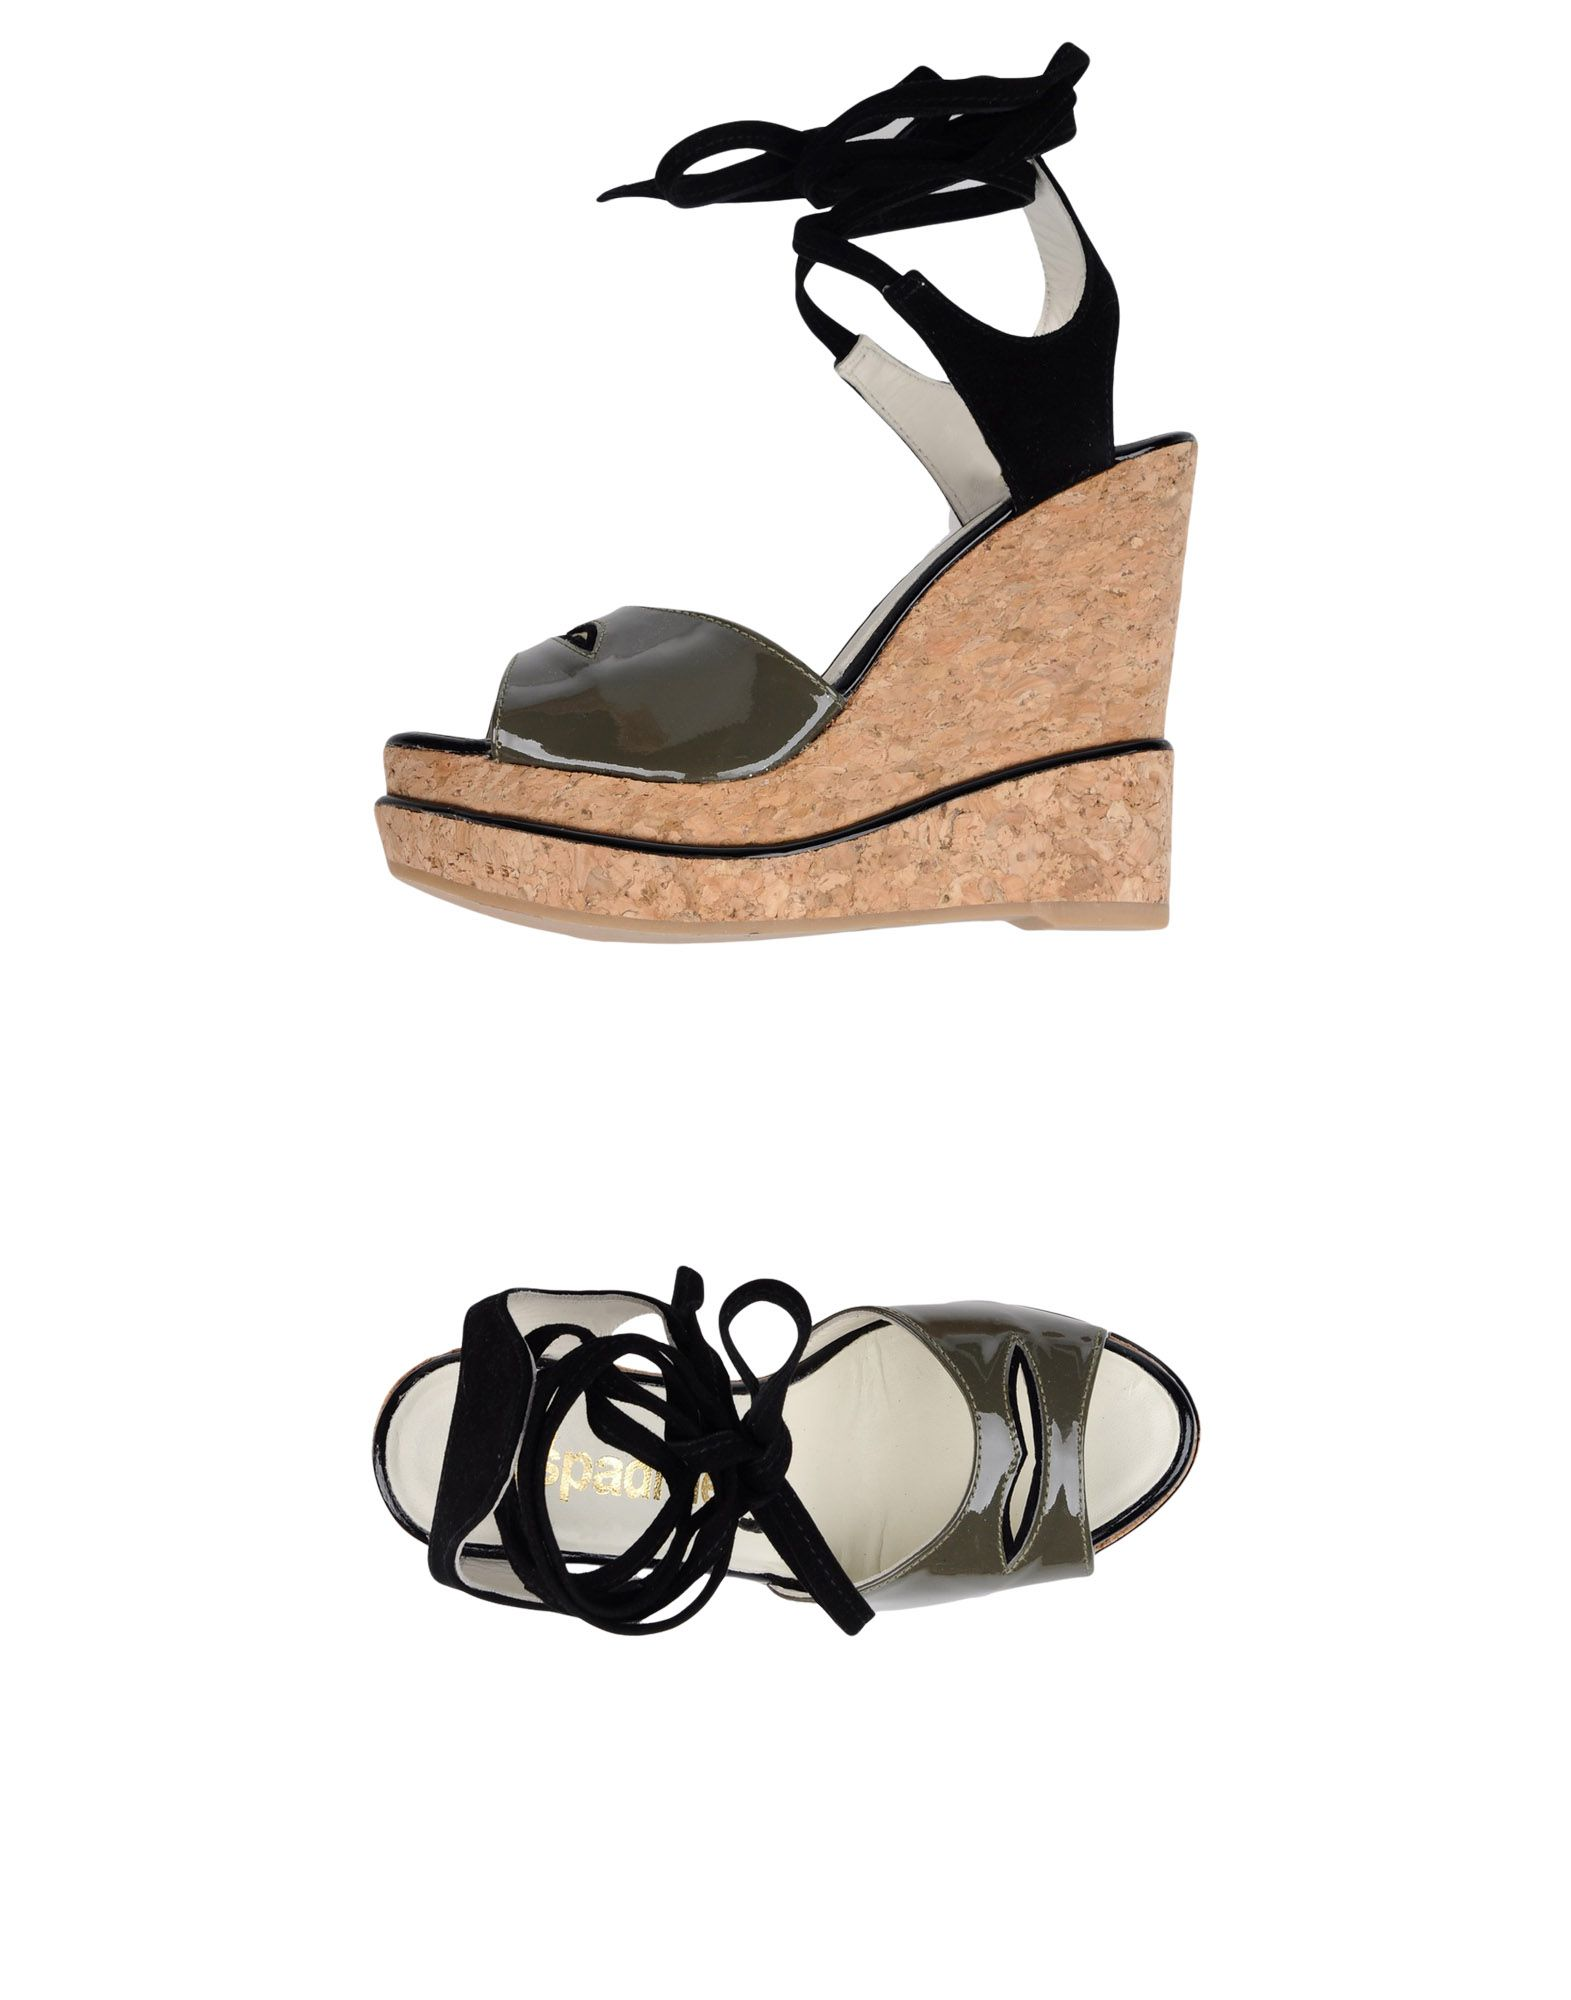 Moda Sandali Espadrilles Donna Donna Espadrilles - 11356564HU ffba72